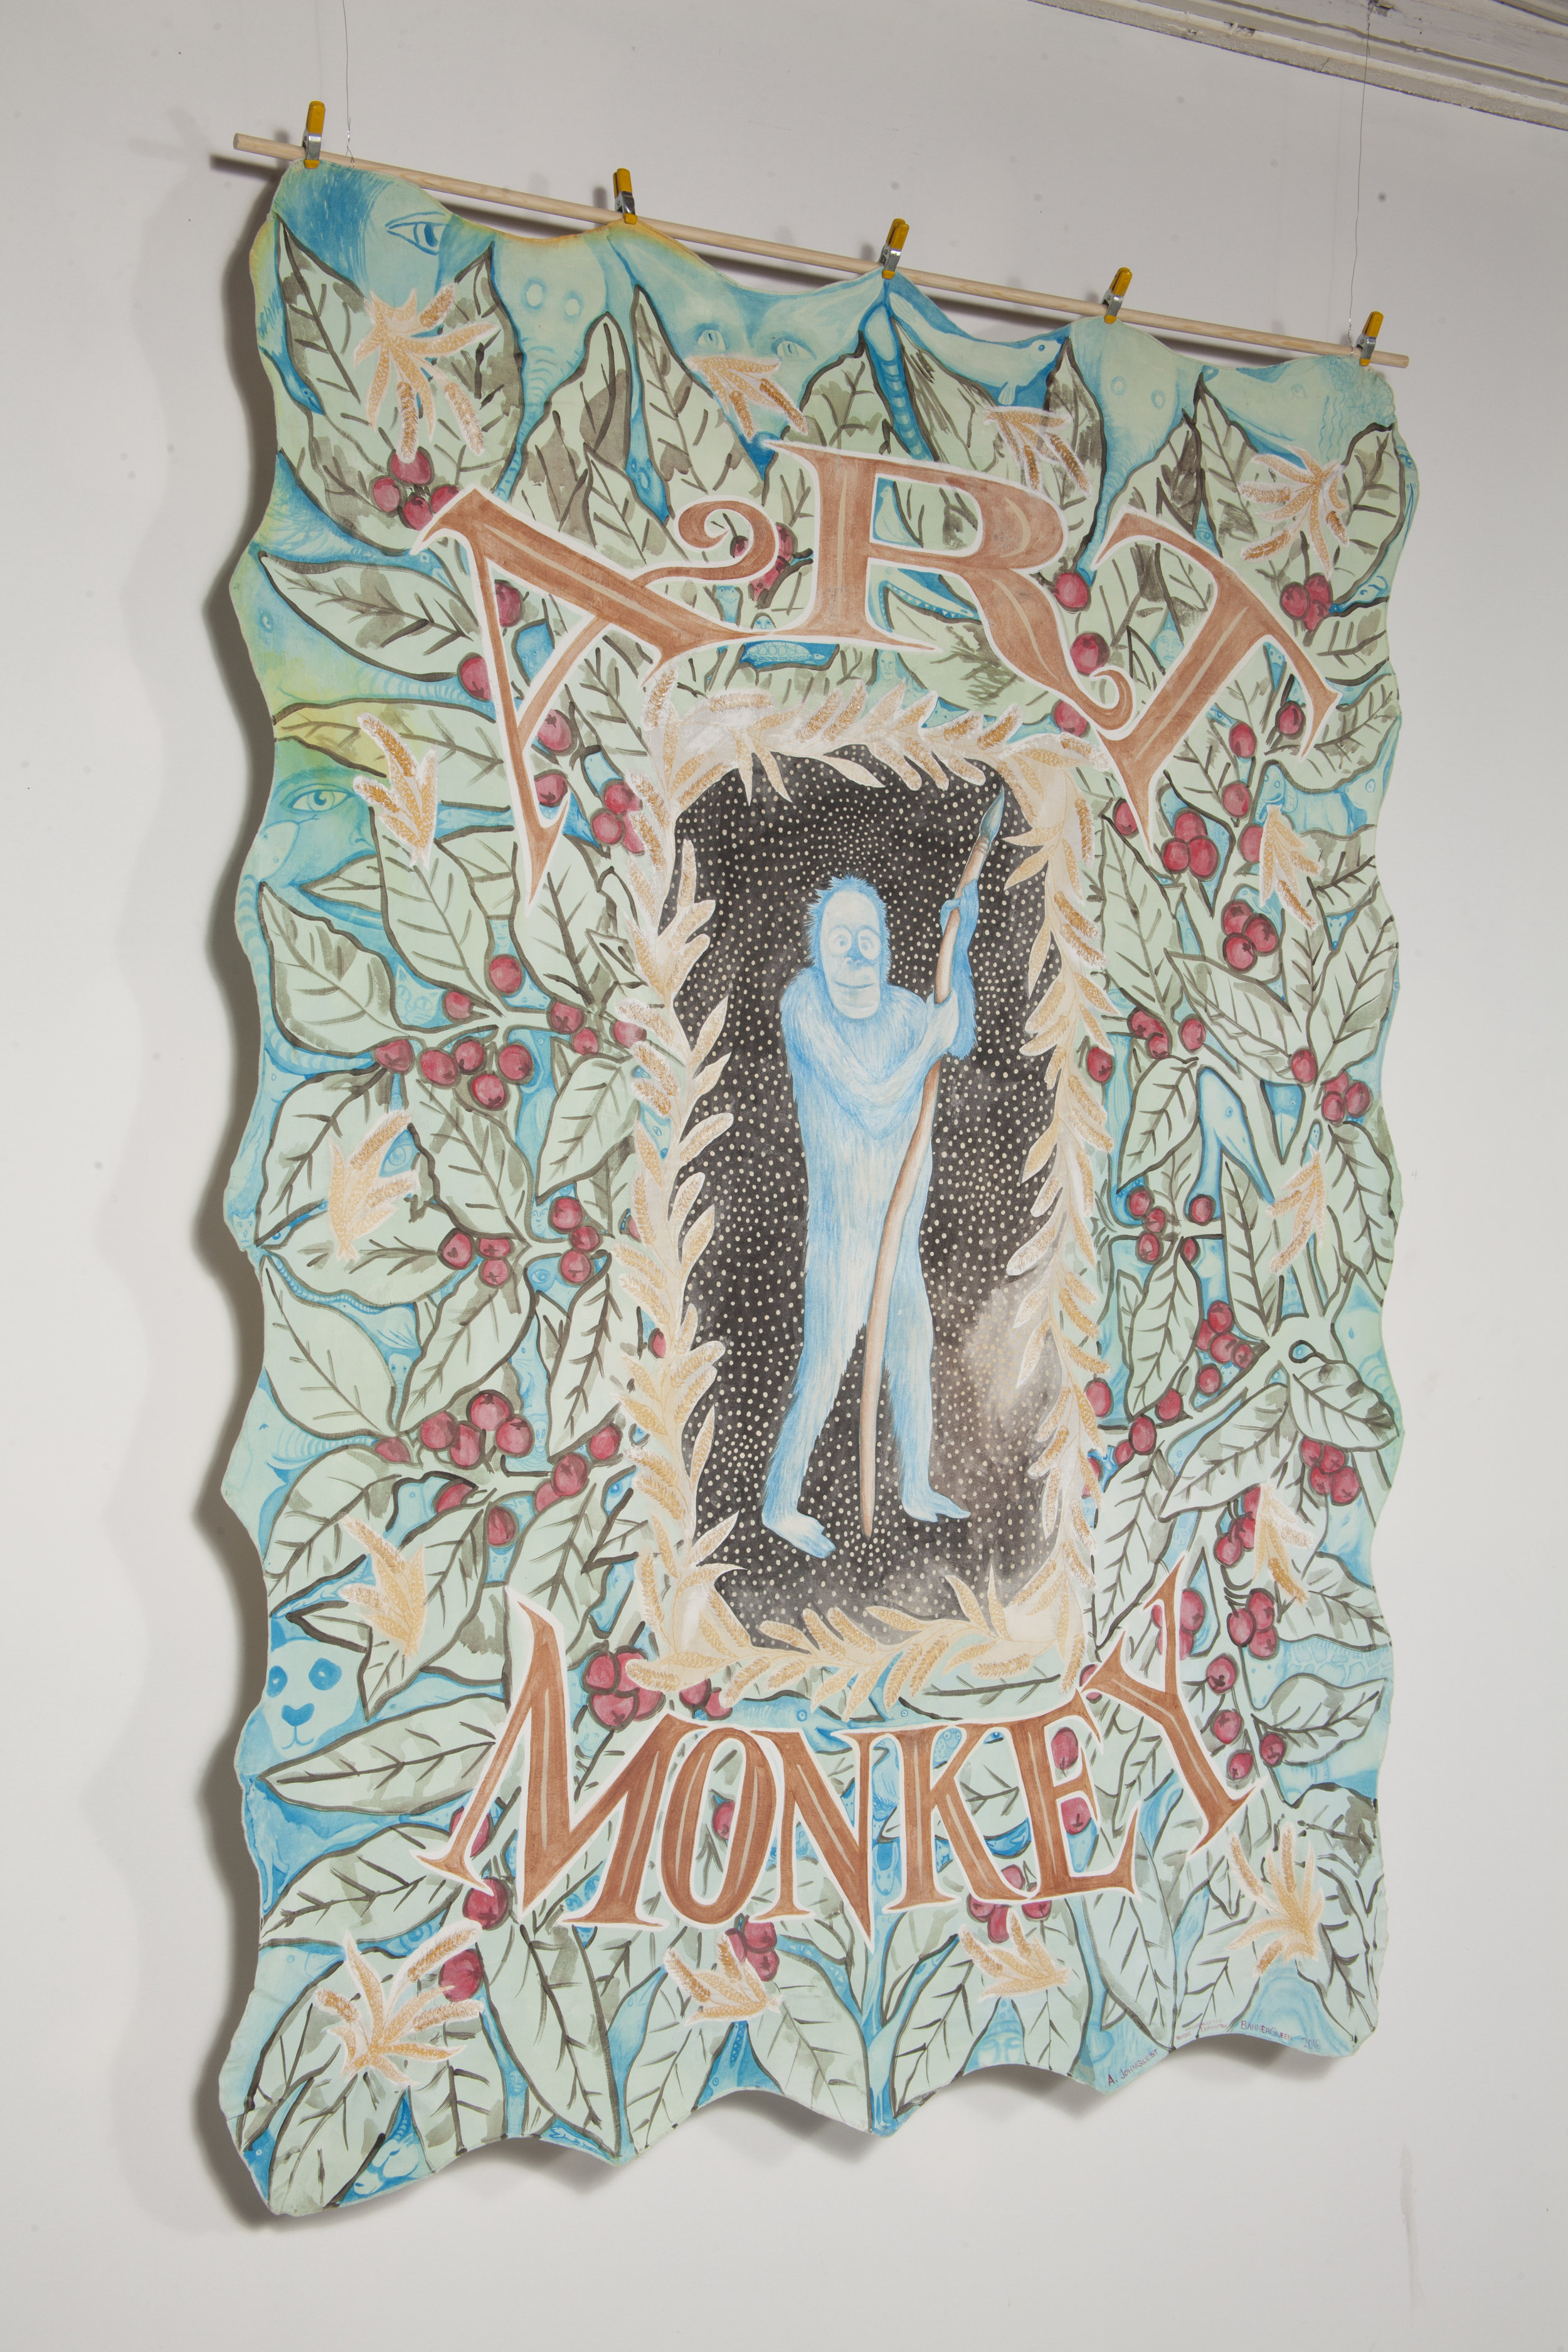 Amy Johnquest | Art Monkey | 2016 | Casien & acrylic on vintage tablecloth